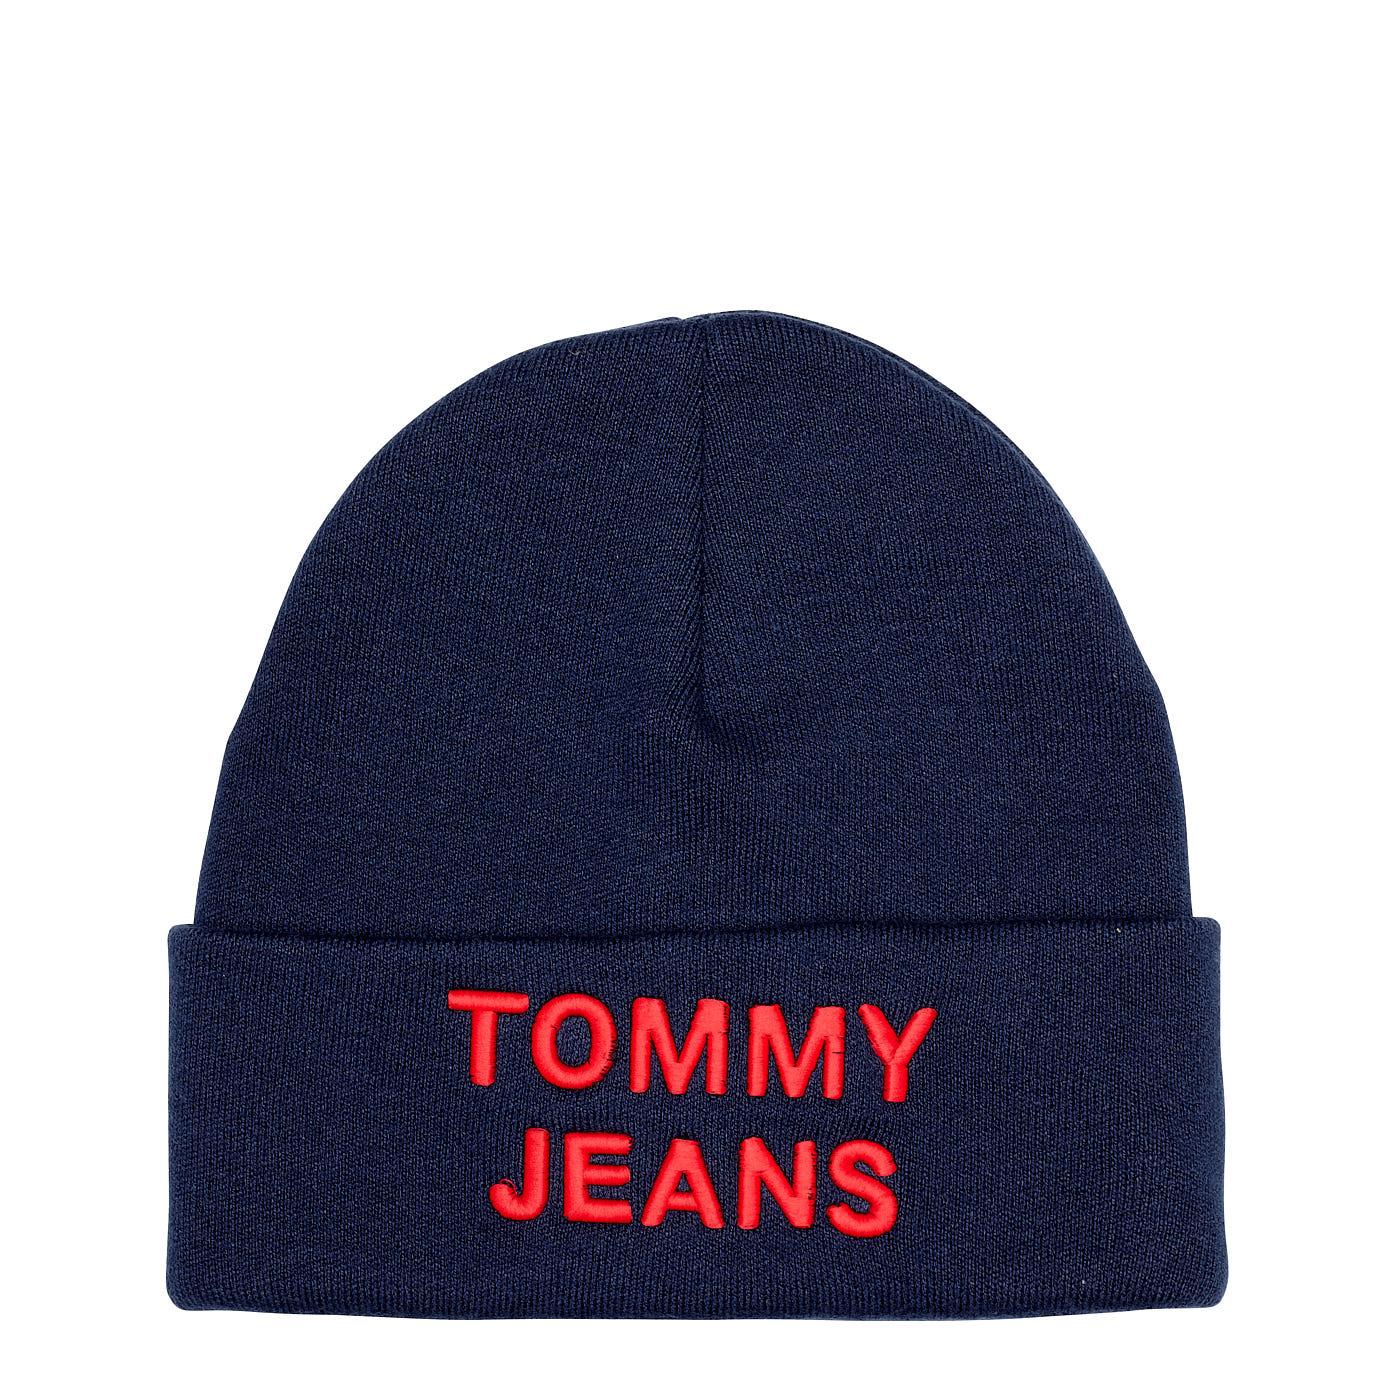 Jeans bonnet AM0AM052050F7001 - Tommy hilfiger - Modalova